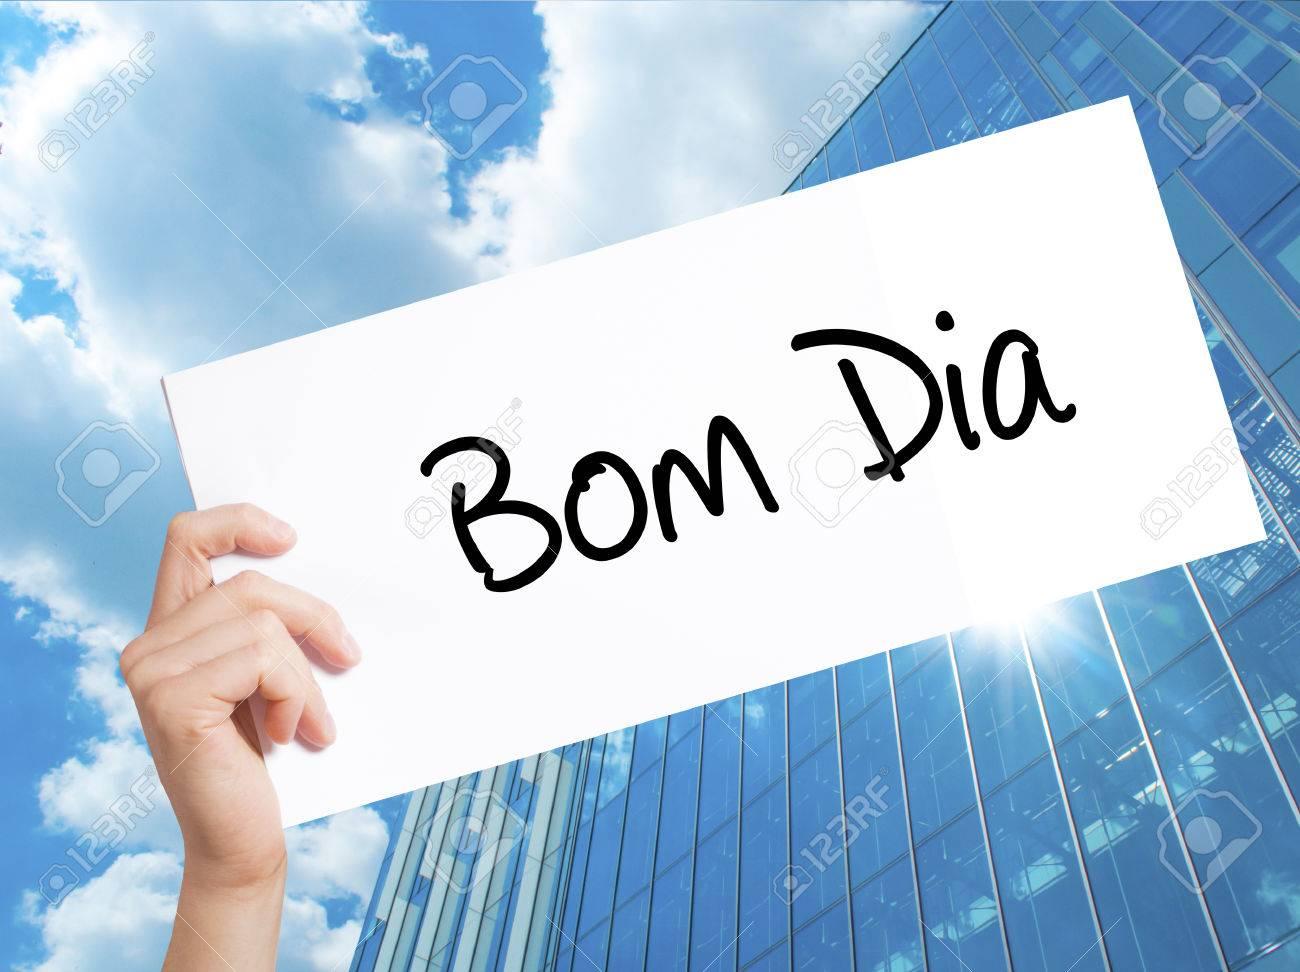 Bom Dia In Portuguese Good Morning Sign On White Stock Photo